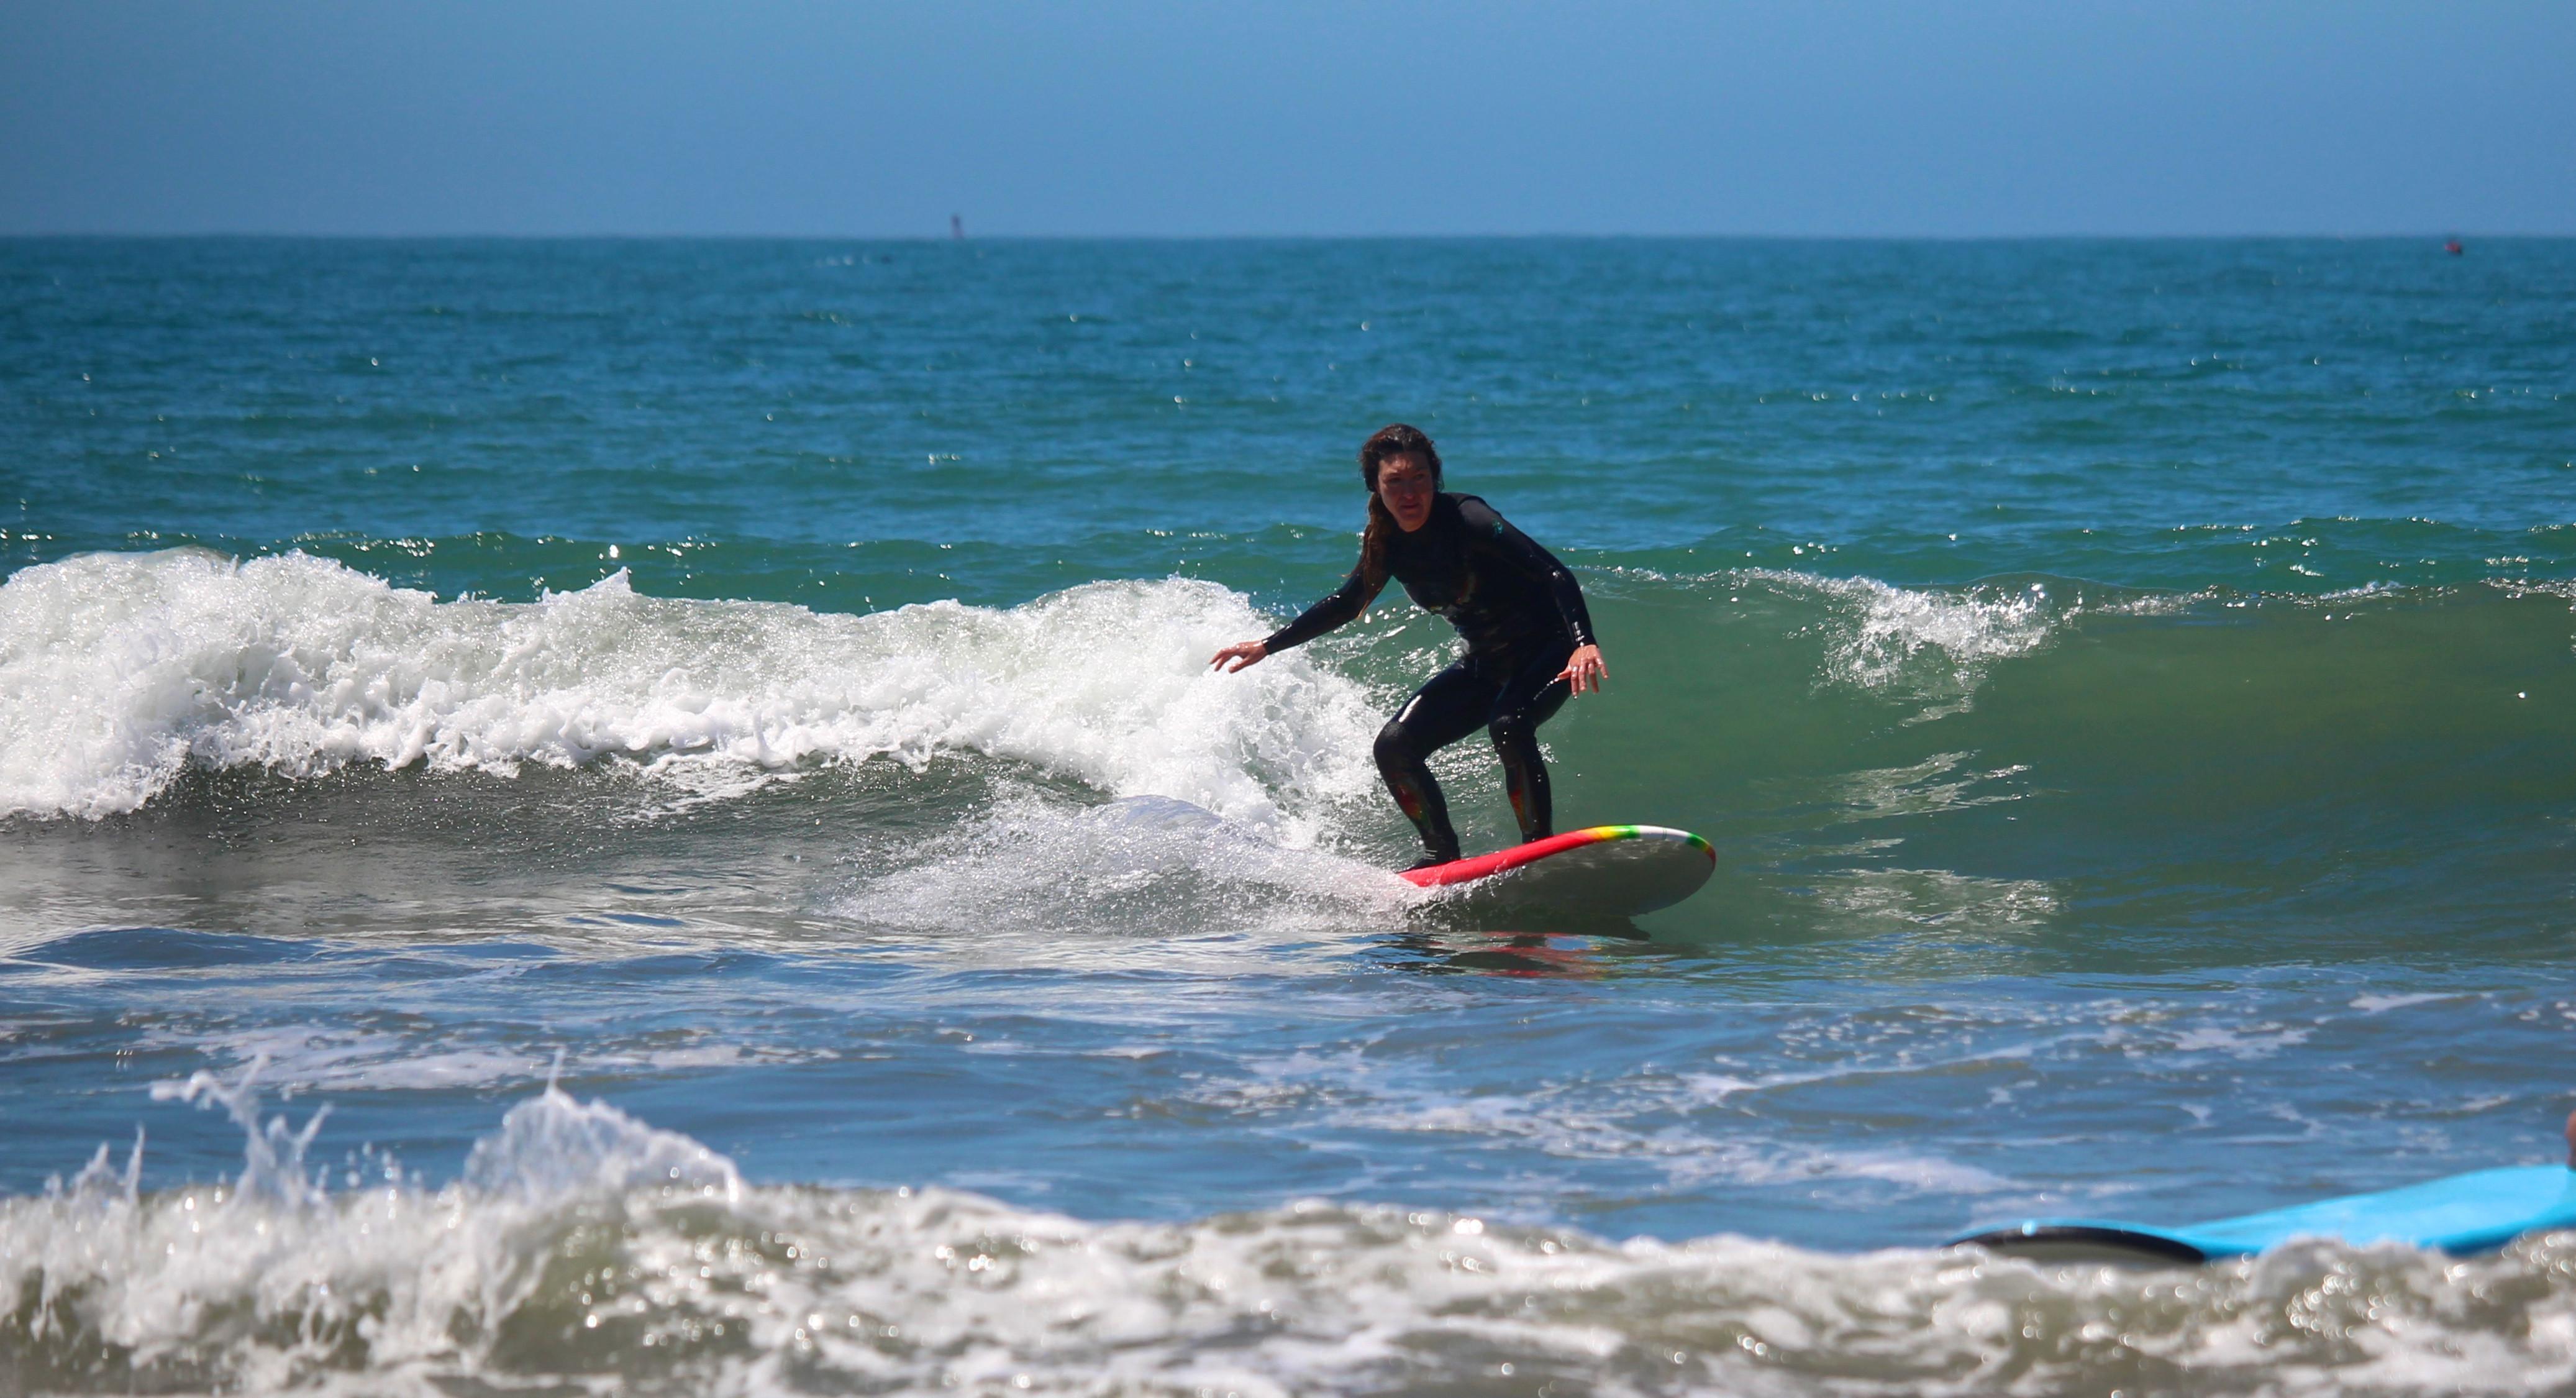 Surf School Group Photoshoot